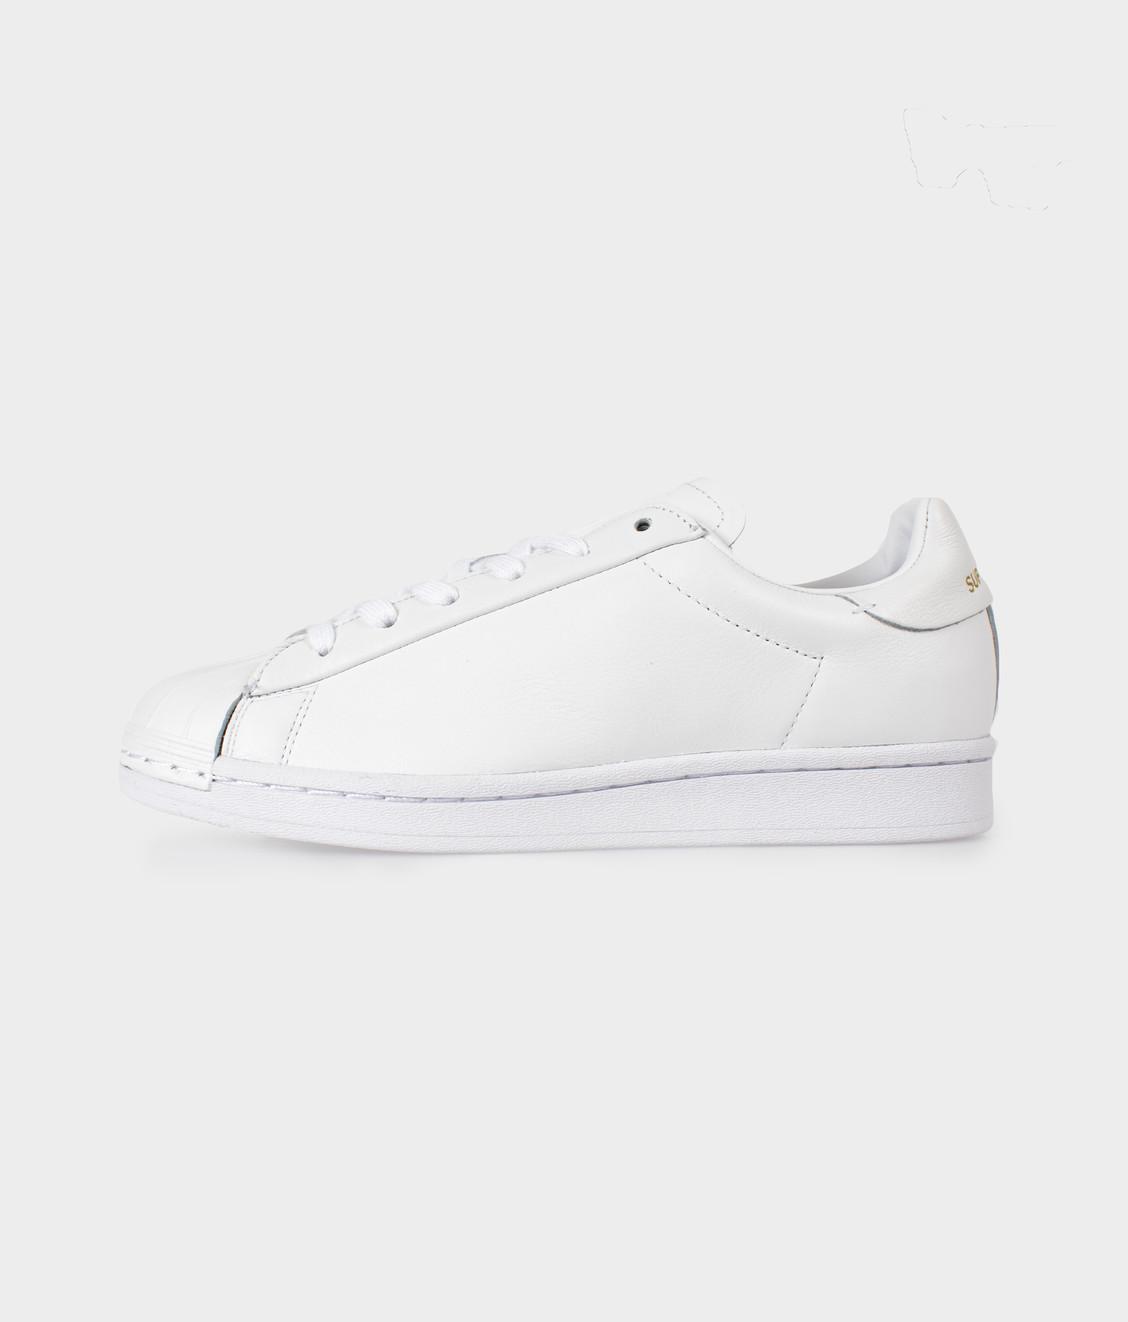 Adidas Adidas Superstar Pure LT White